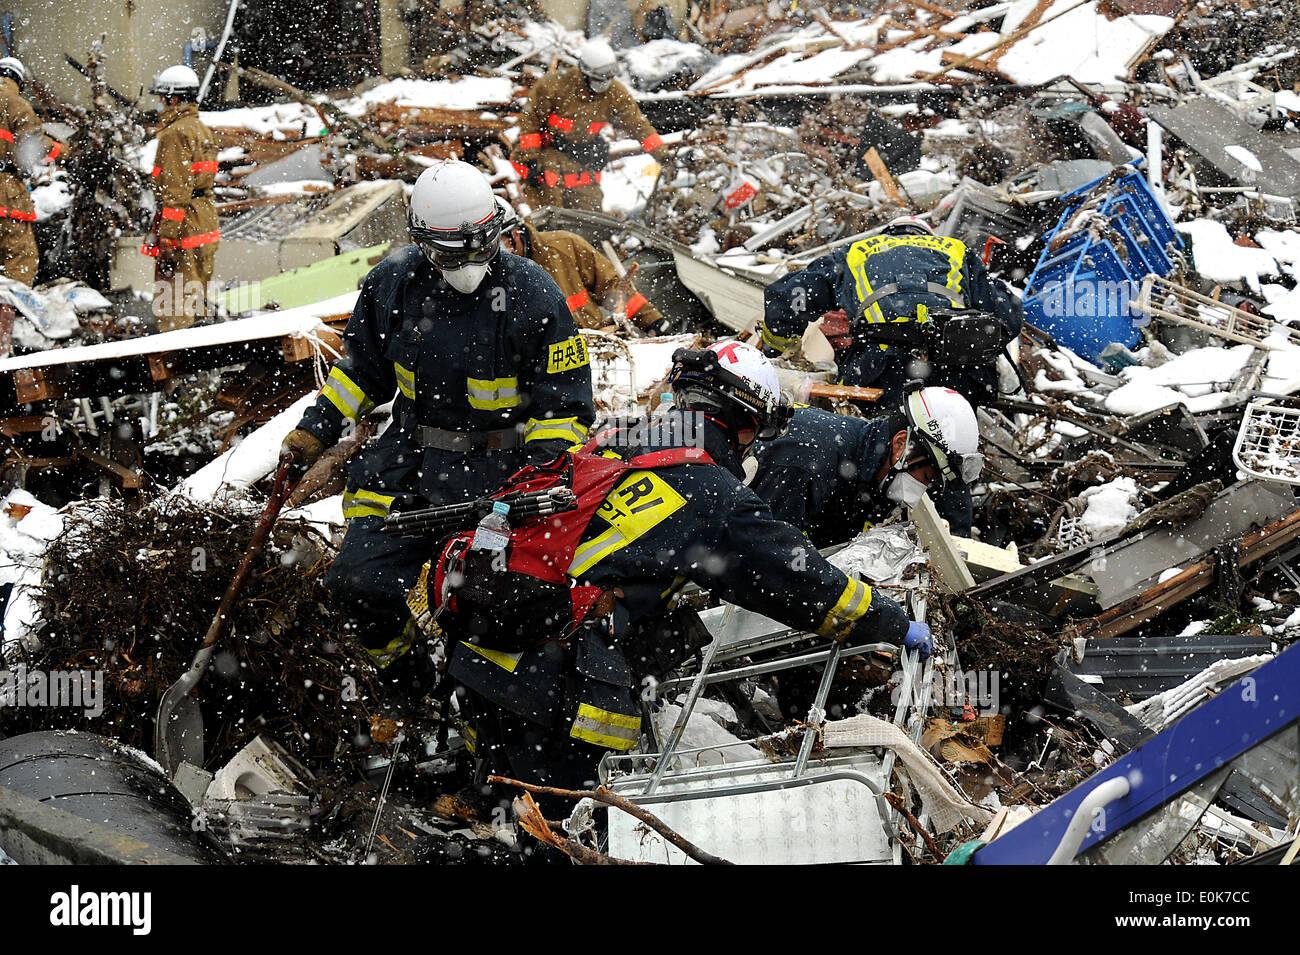 Jpearthquake11 Imágenes De Stock & Jpearthquake11 Fotos De Stock - Alamy